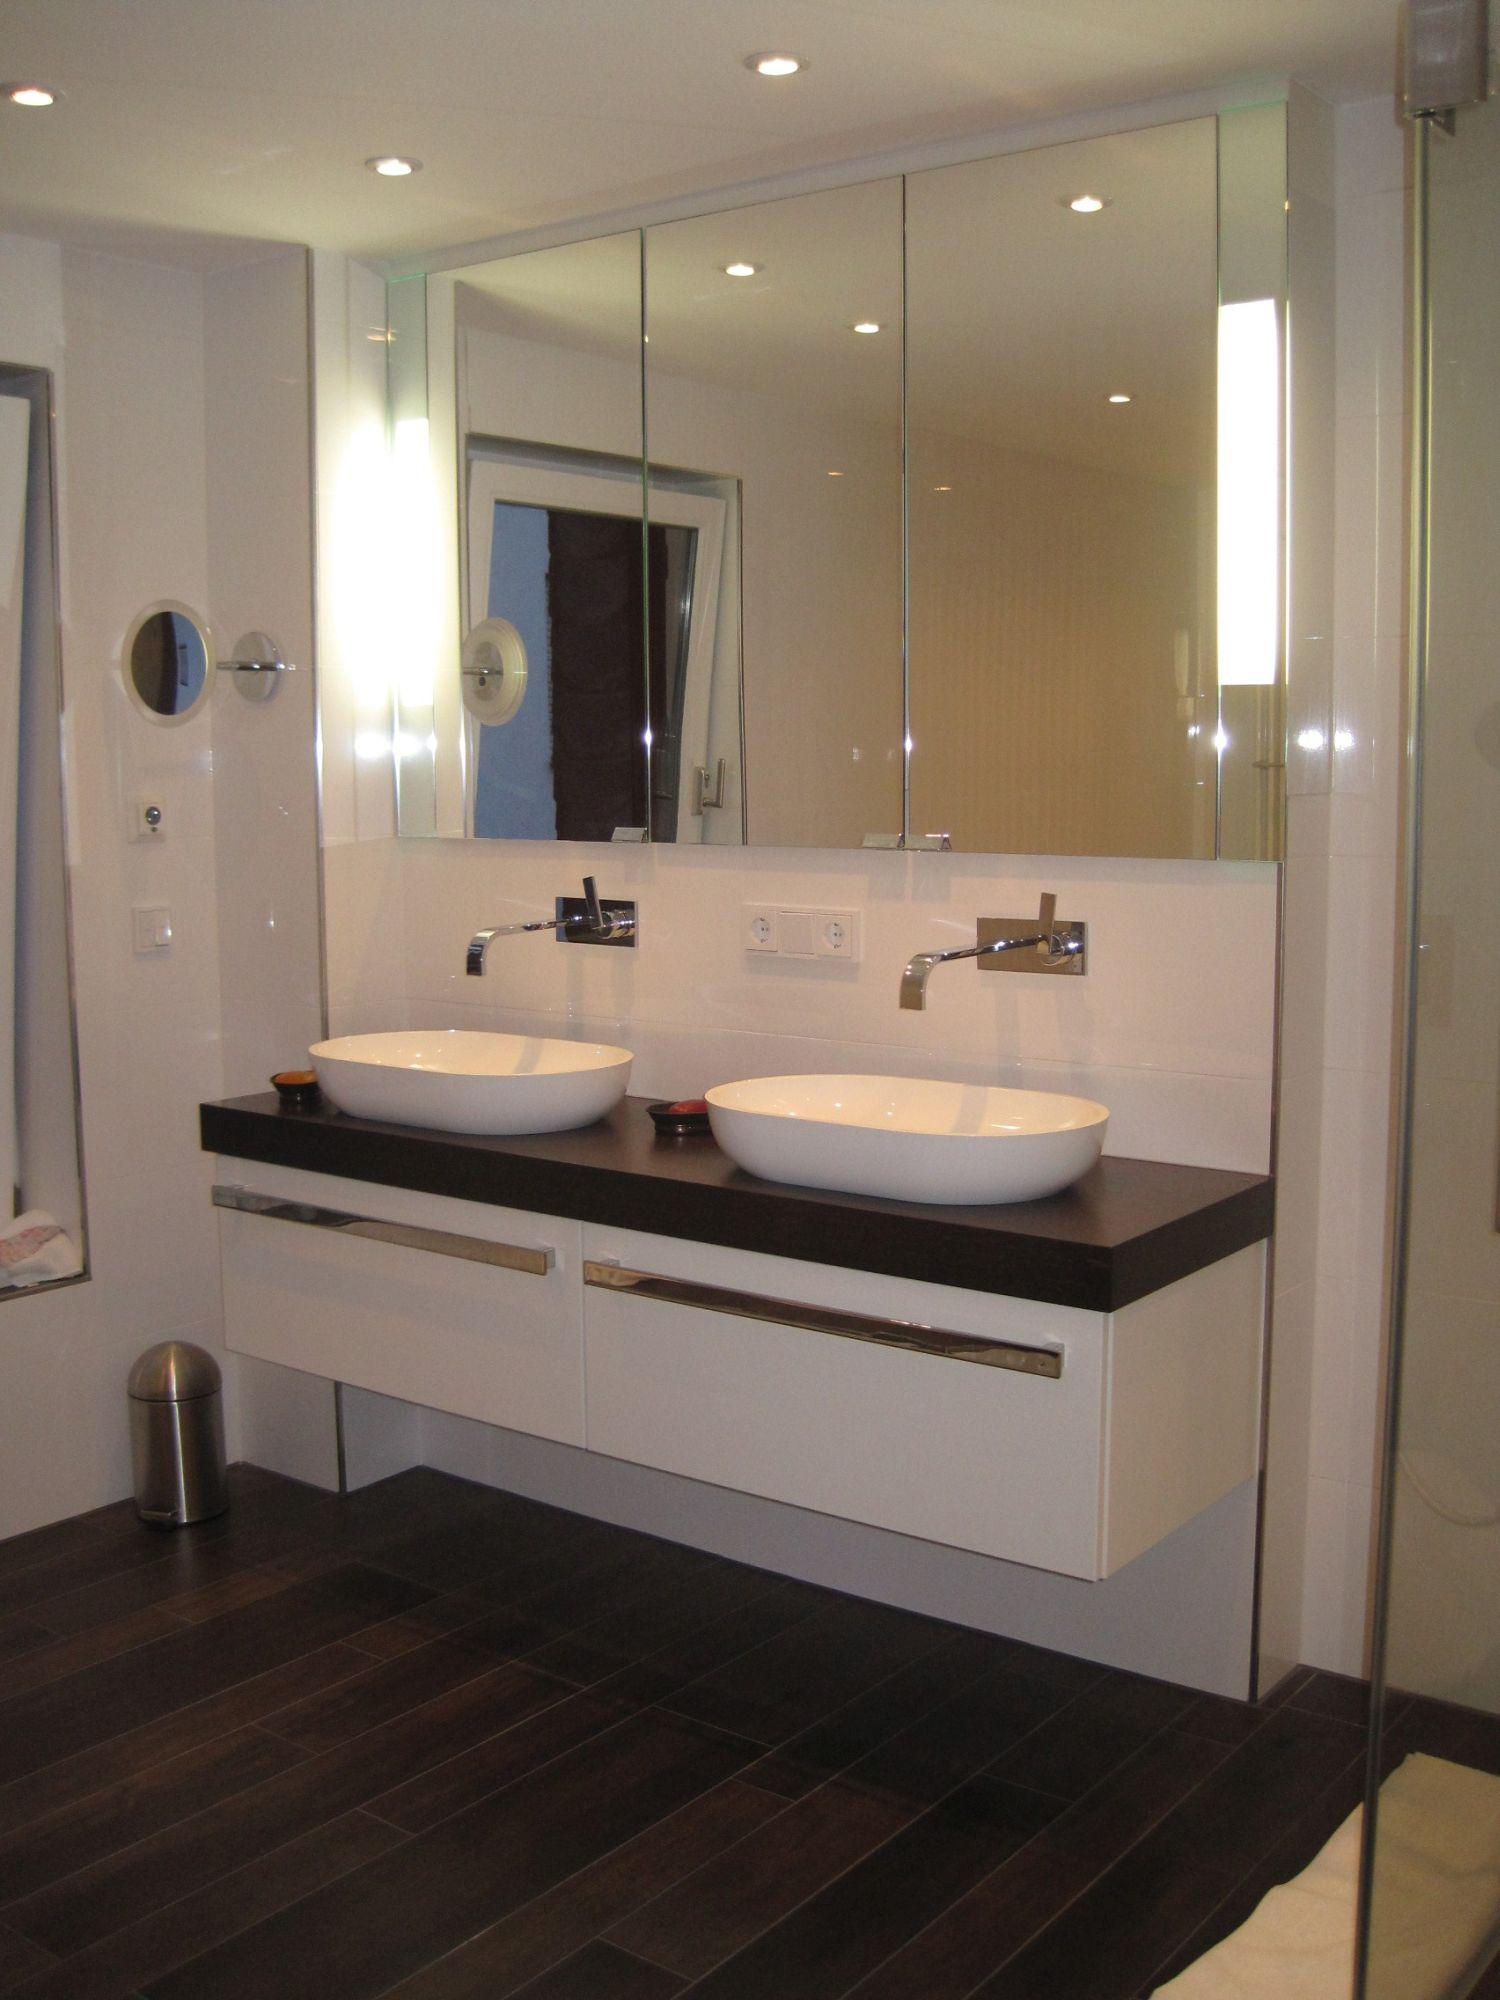 waschtisch echtholz waschtisch echtholz haus dekoration. Black Bedroom Furniture Sets. Home Design Ideas